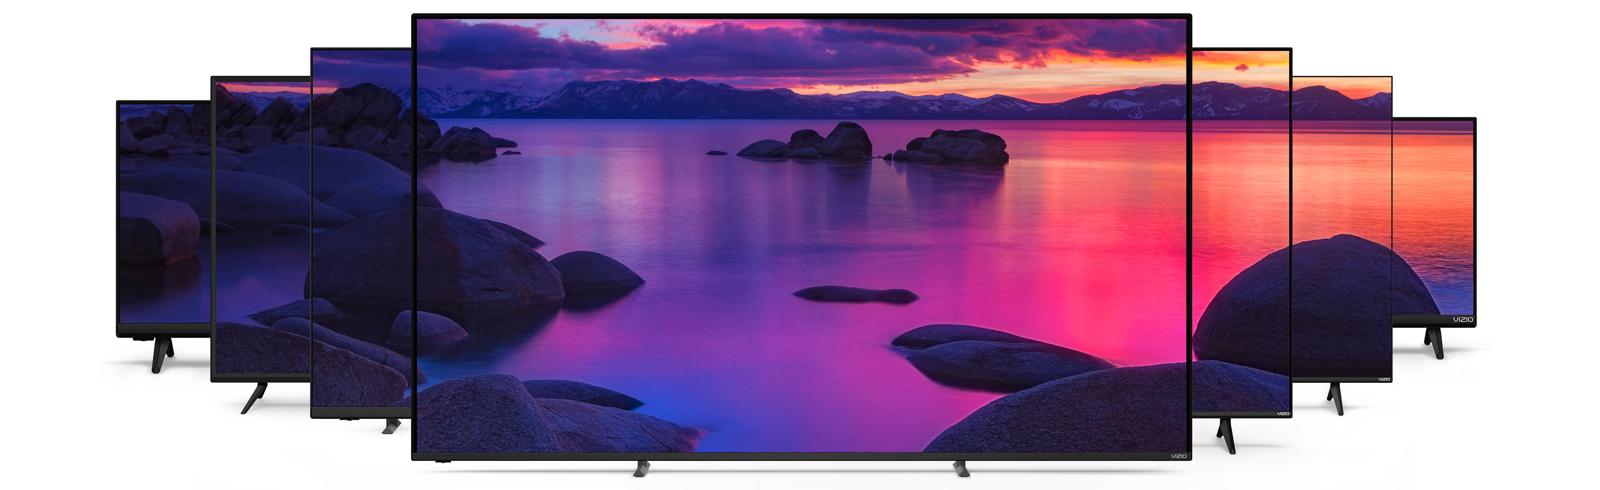 2022 Vizio P-series, M-Series, V-series, and D-series TVs are unveiled